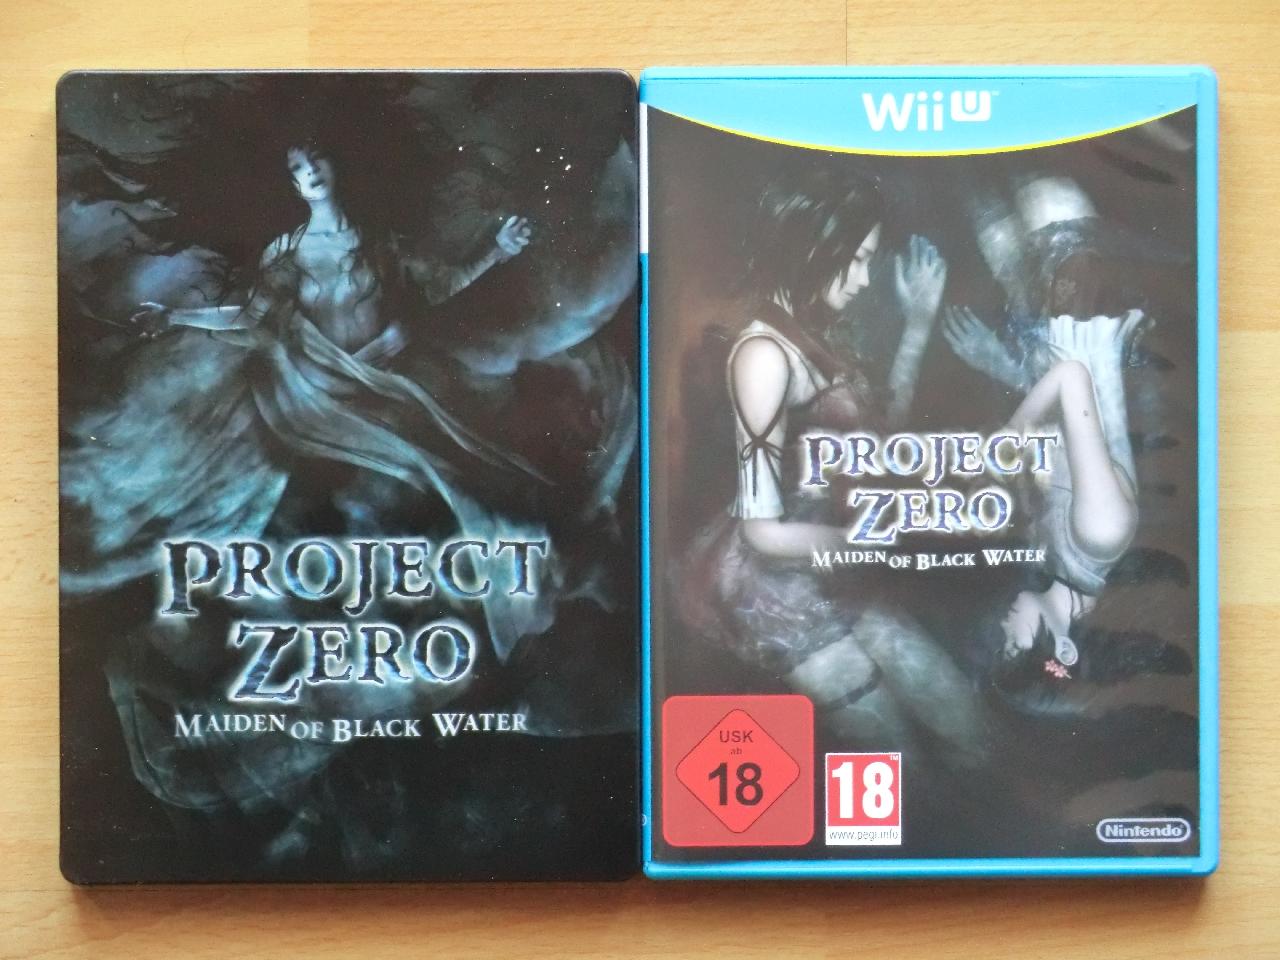 Project Zero Maiden of Black Water Wii U Survival Horror Fatal Frame Limited Edition Steelbook